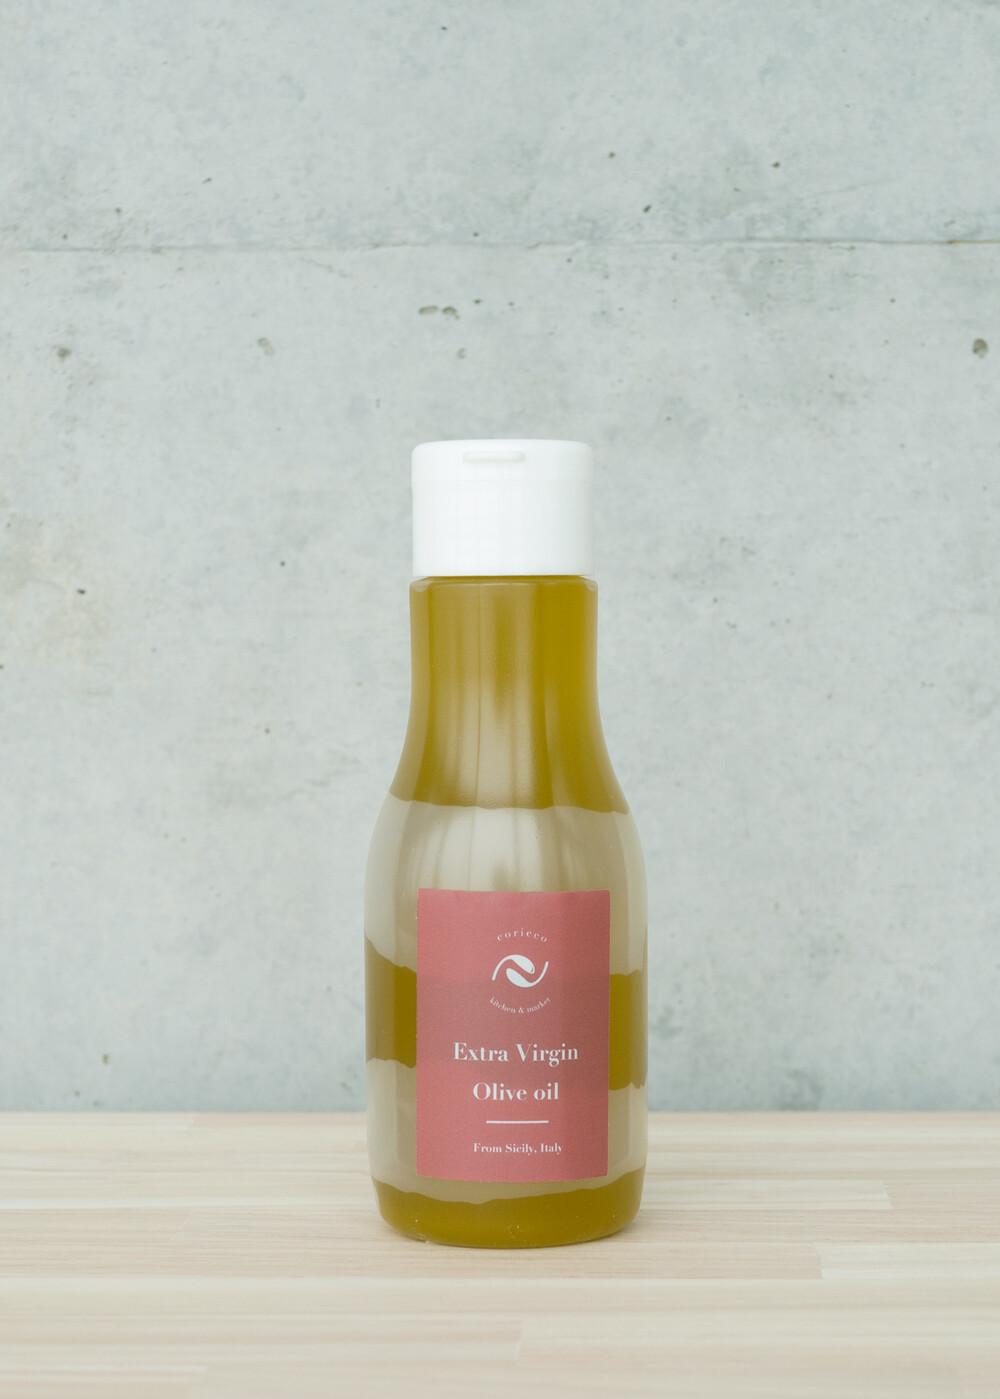 coricco Extra Virgin Olive Oil 230ml 3本セット